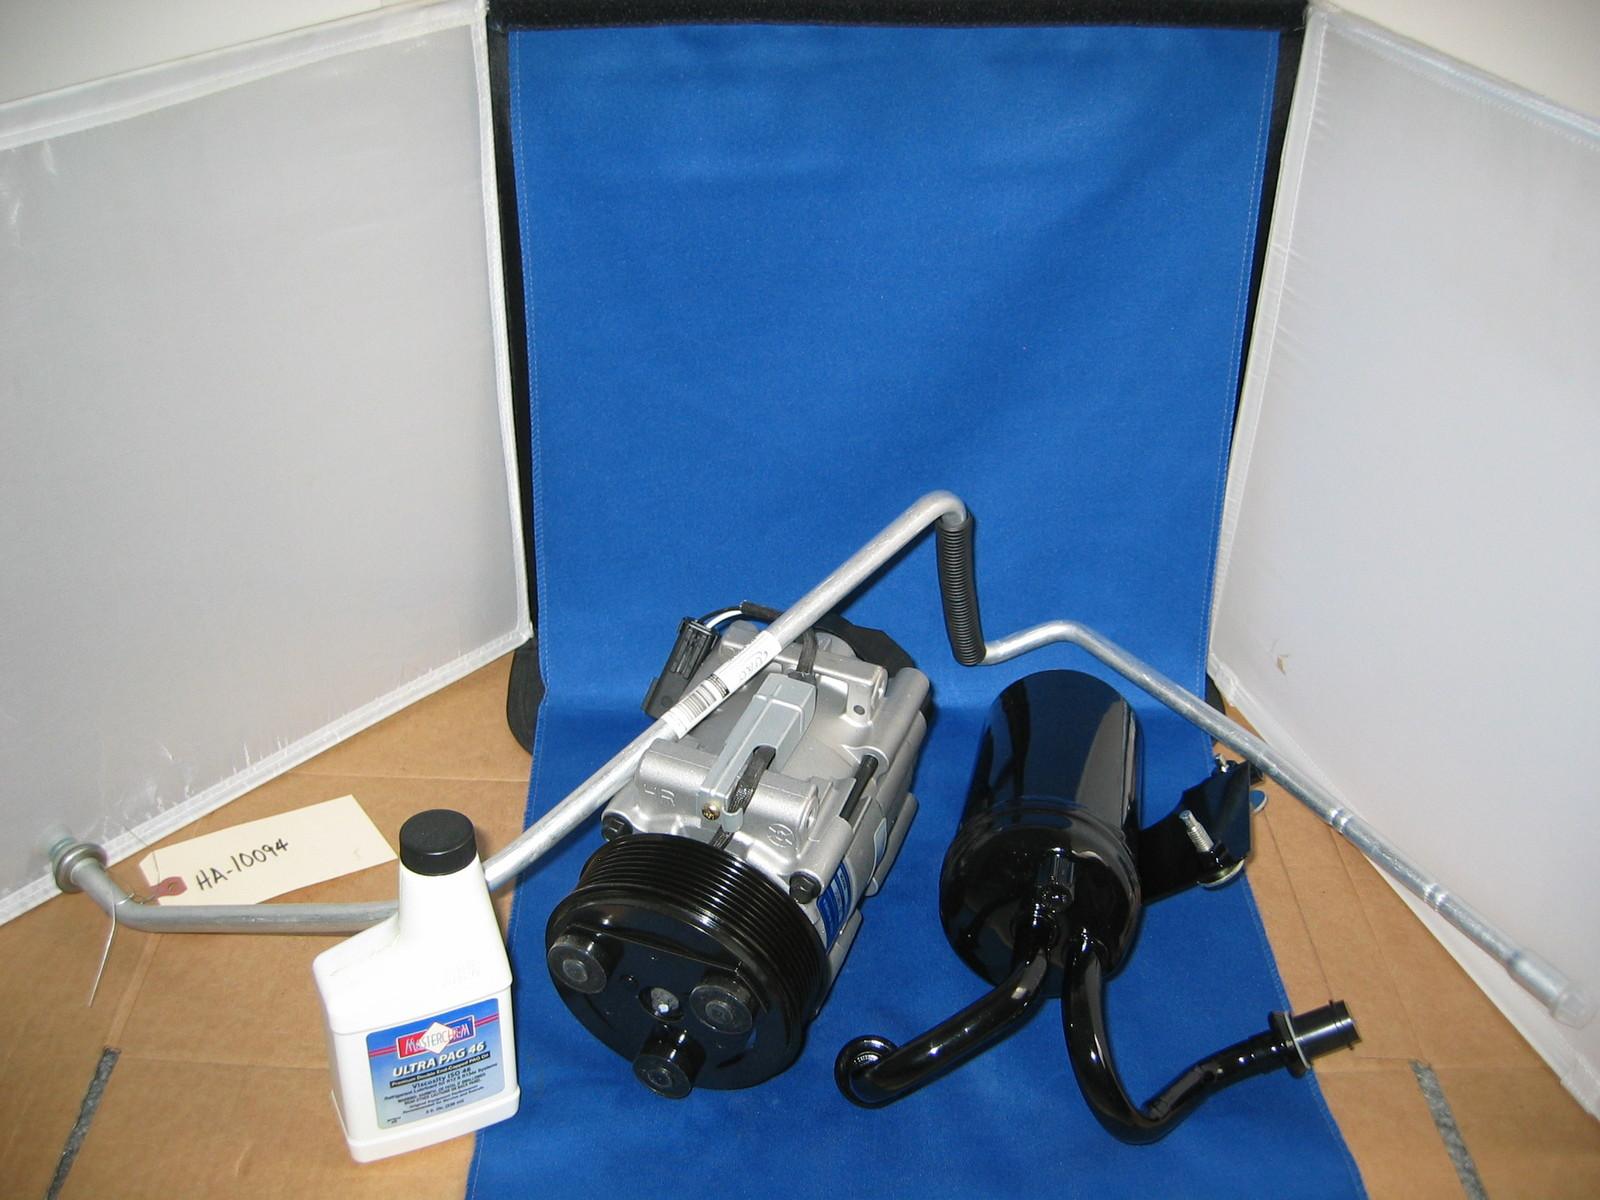 06 09 dodge ram 2500 3500 5.9 6.7 diesel auto air ac conditioning compressor kit  1